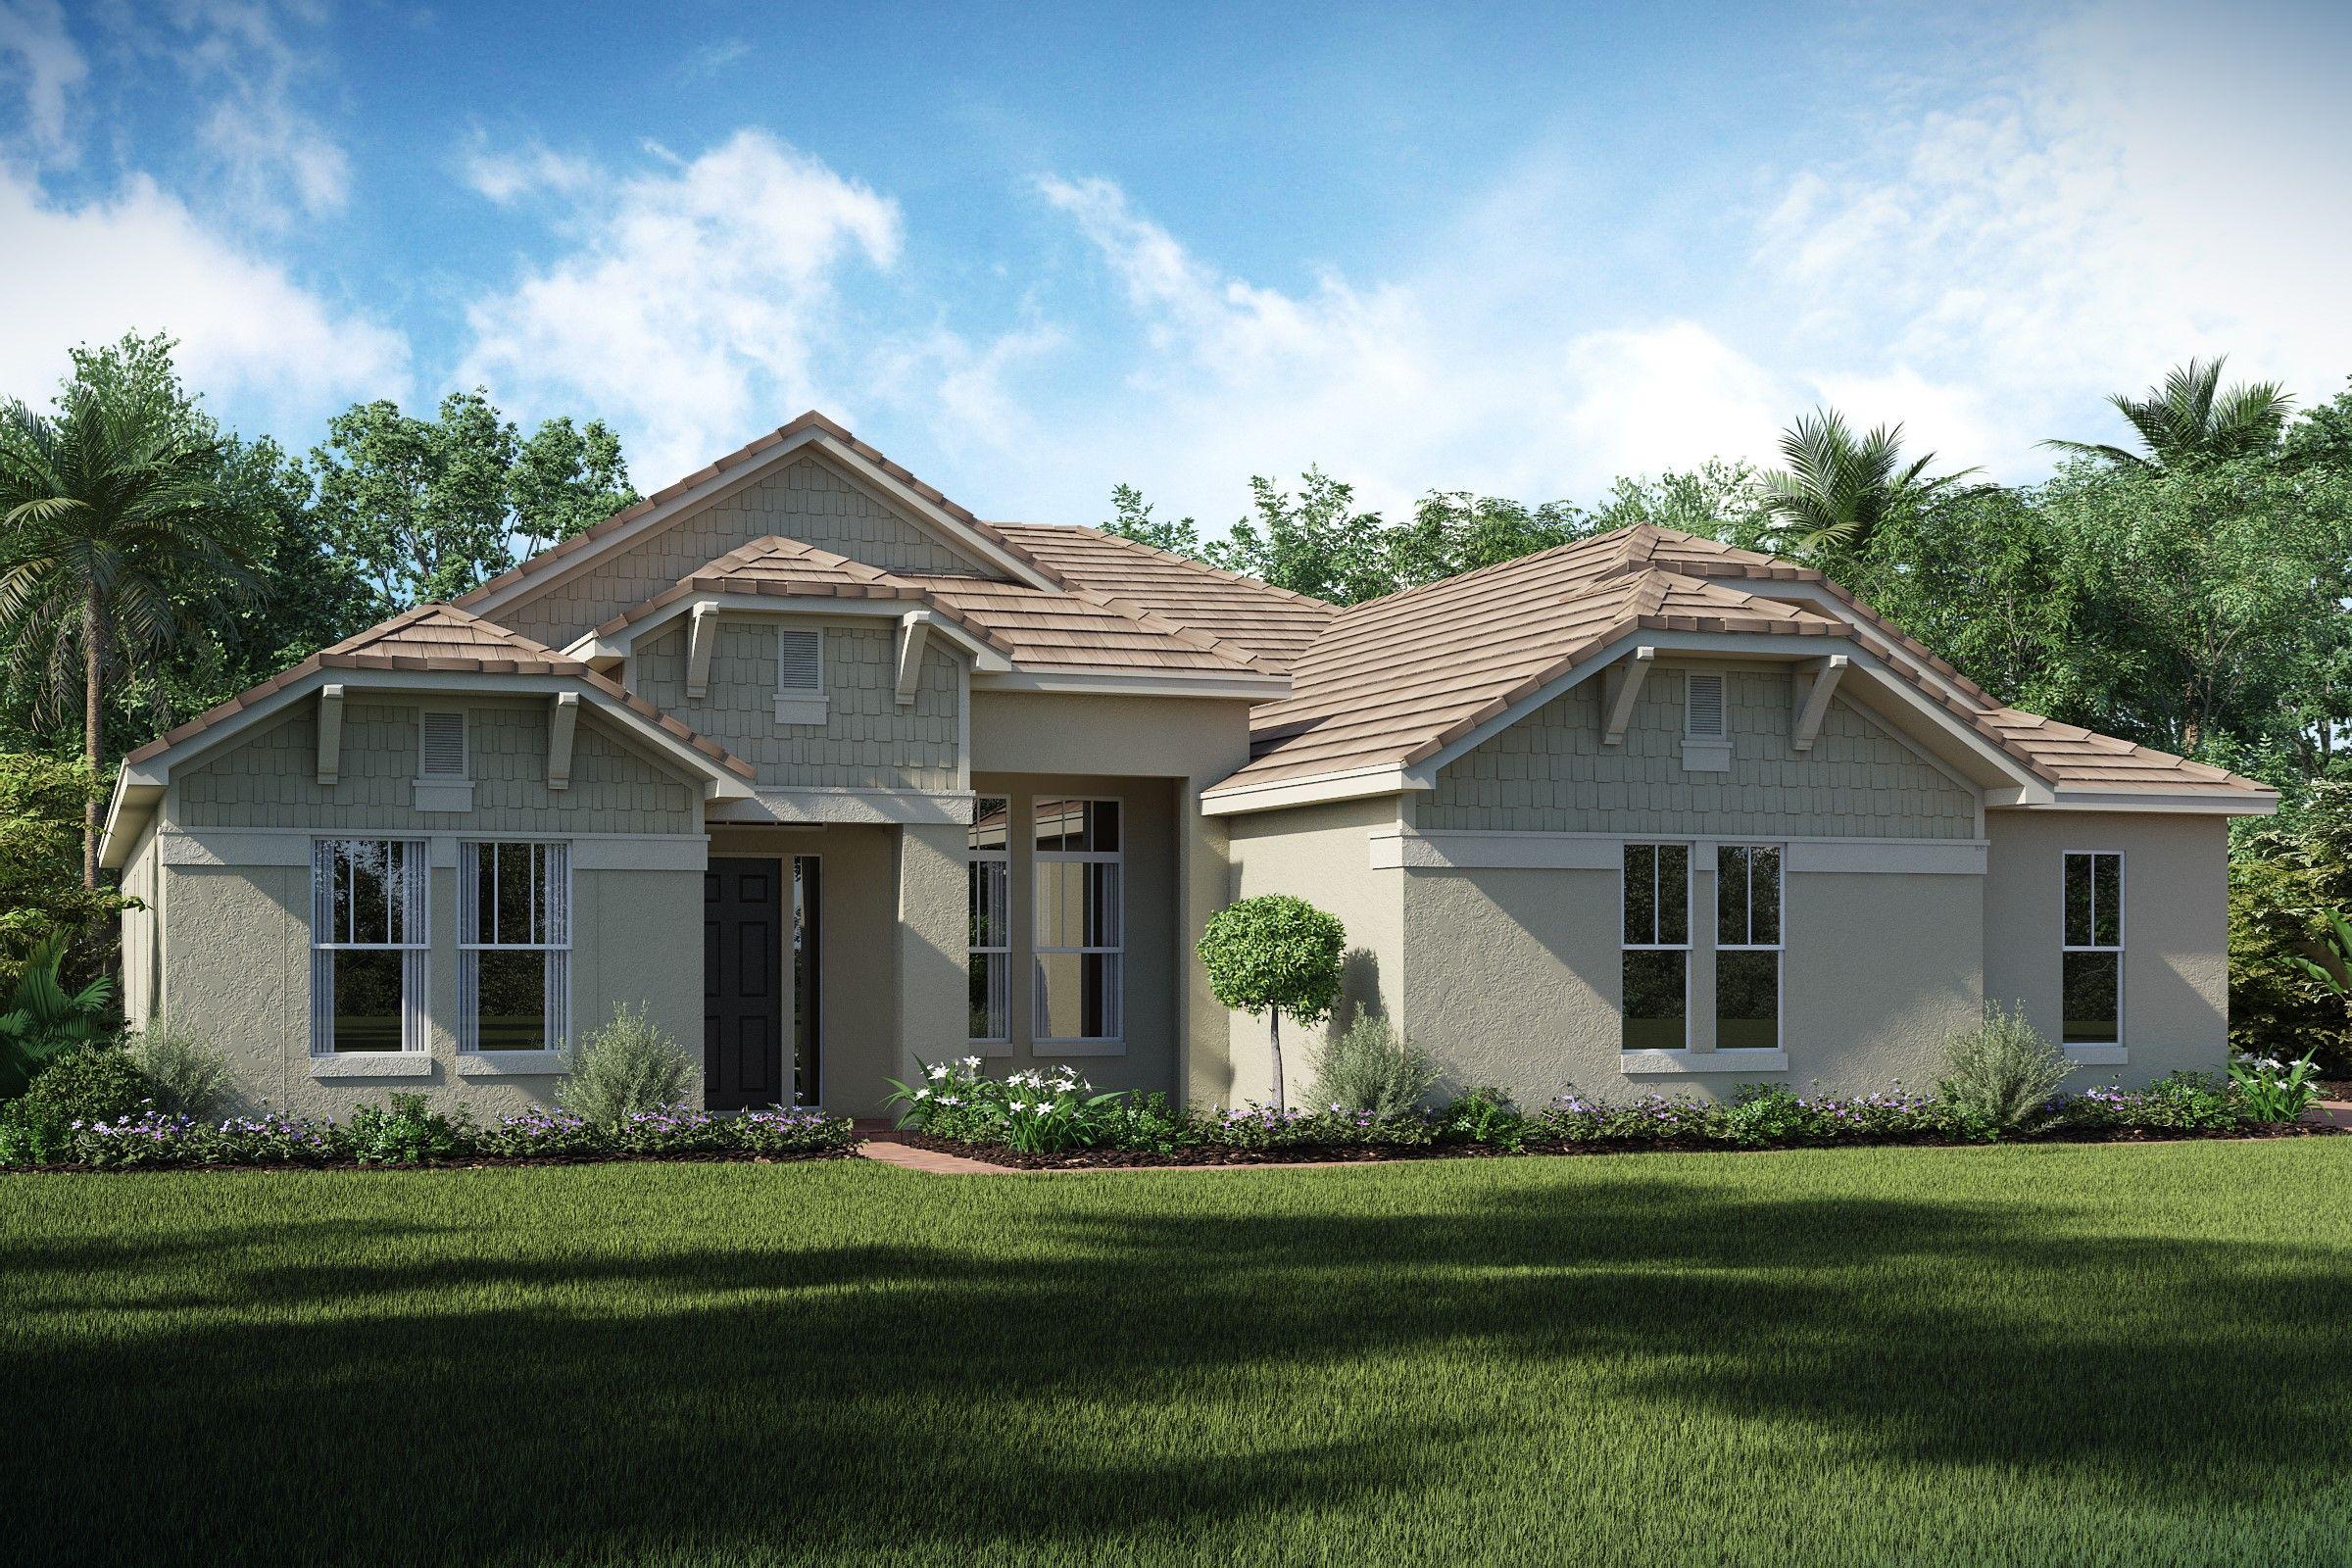 Single Family for Sale at Gosford 31746 Red Tail Blvd, Homesite 238 Sorrento, Florida 32776 United States